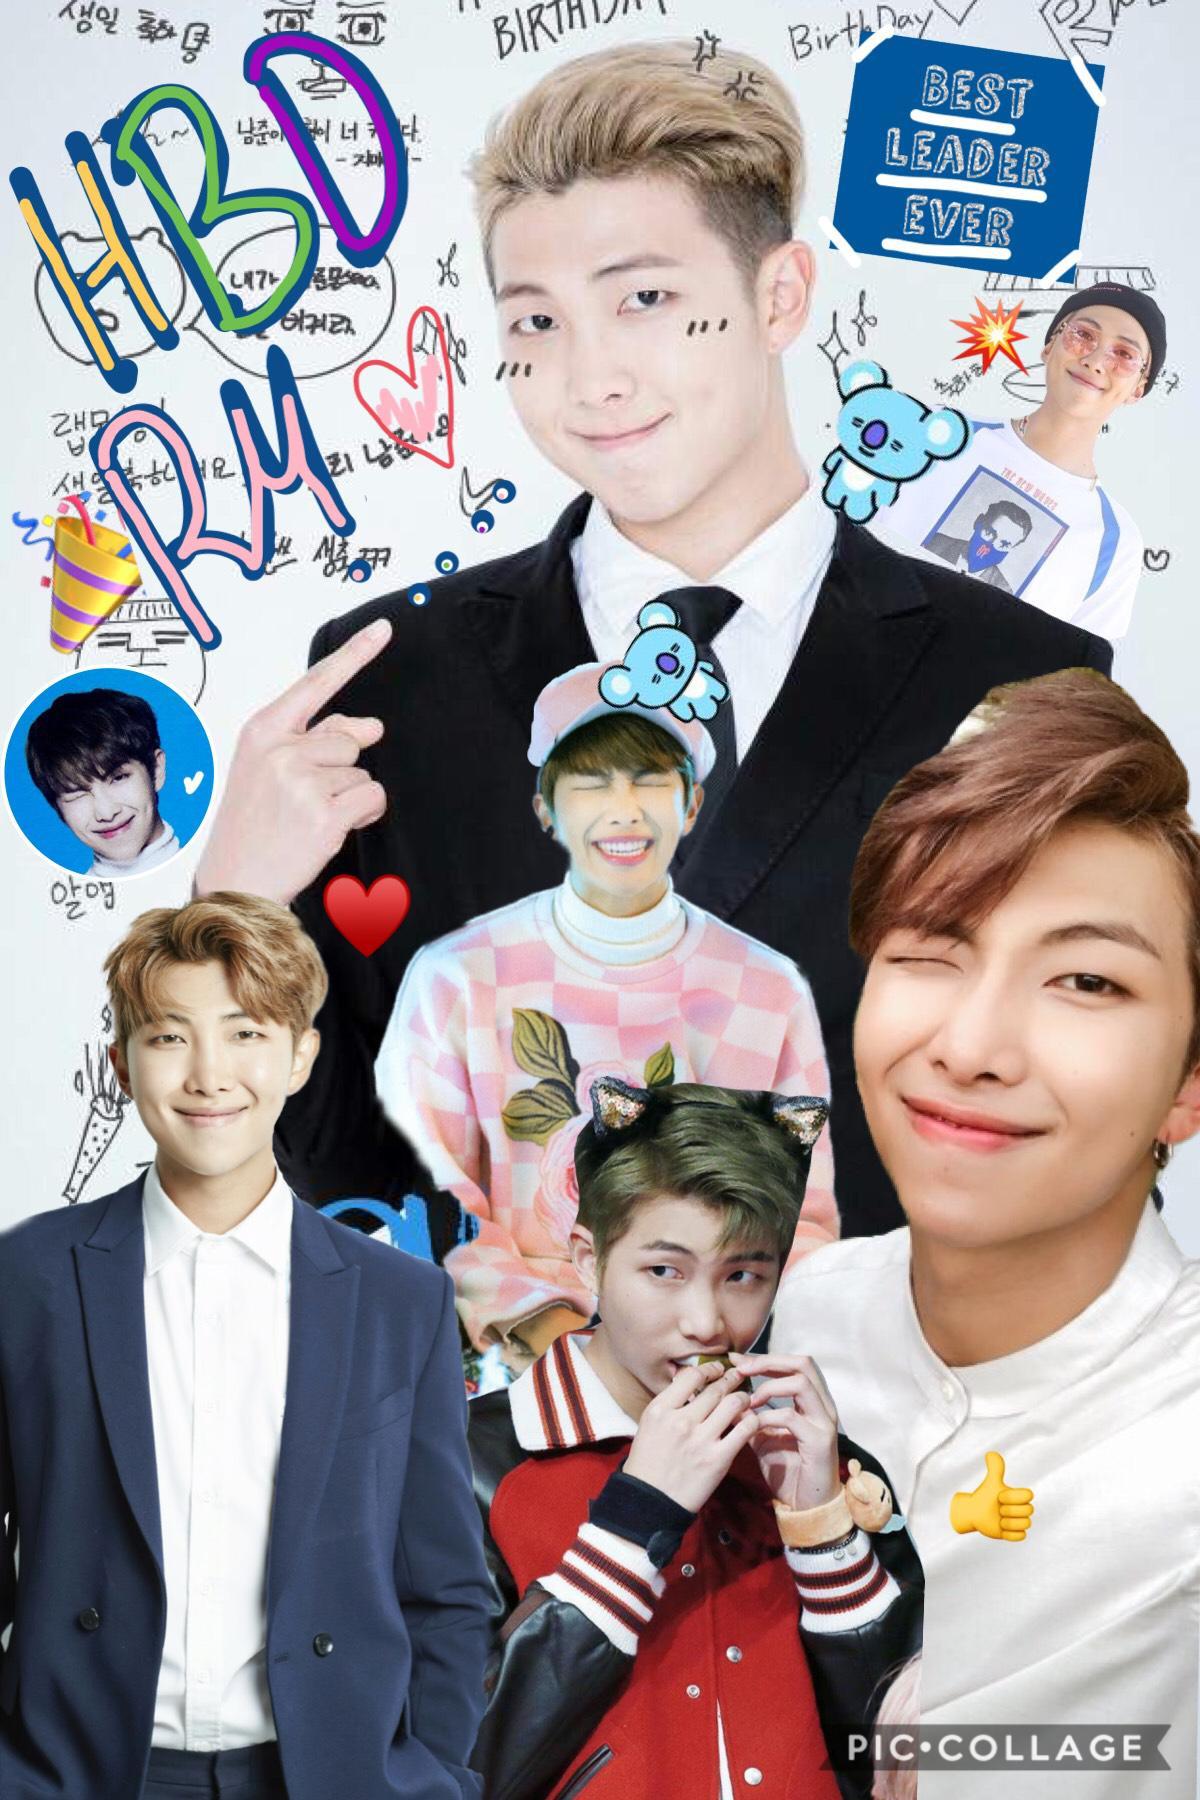 Happy birthday RM-BTS🎉🎉🎉❤️❤️❤️